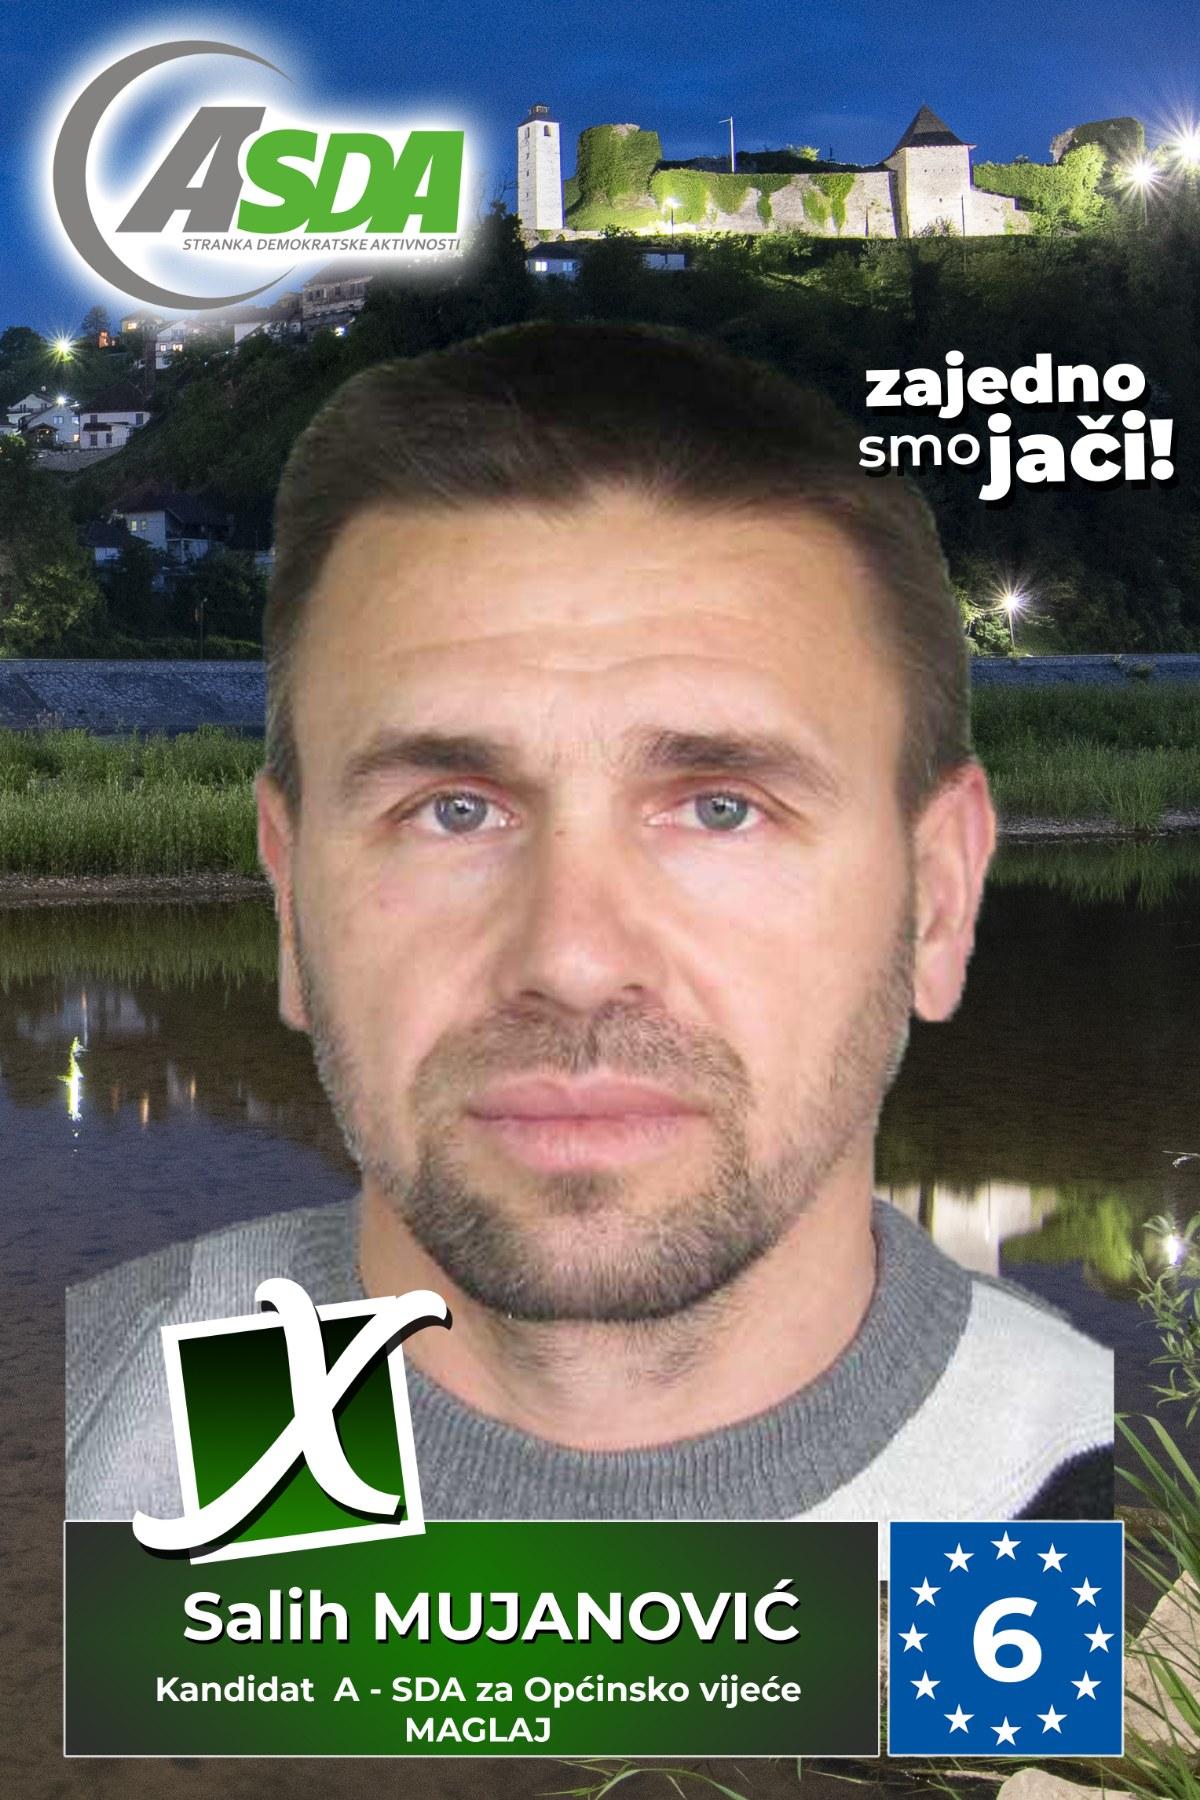 Salih Mujanović